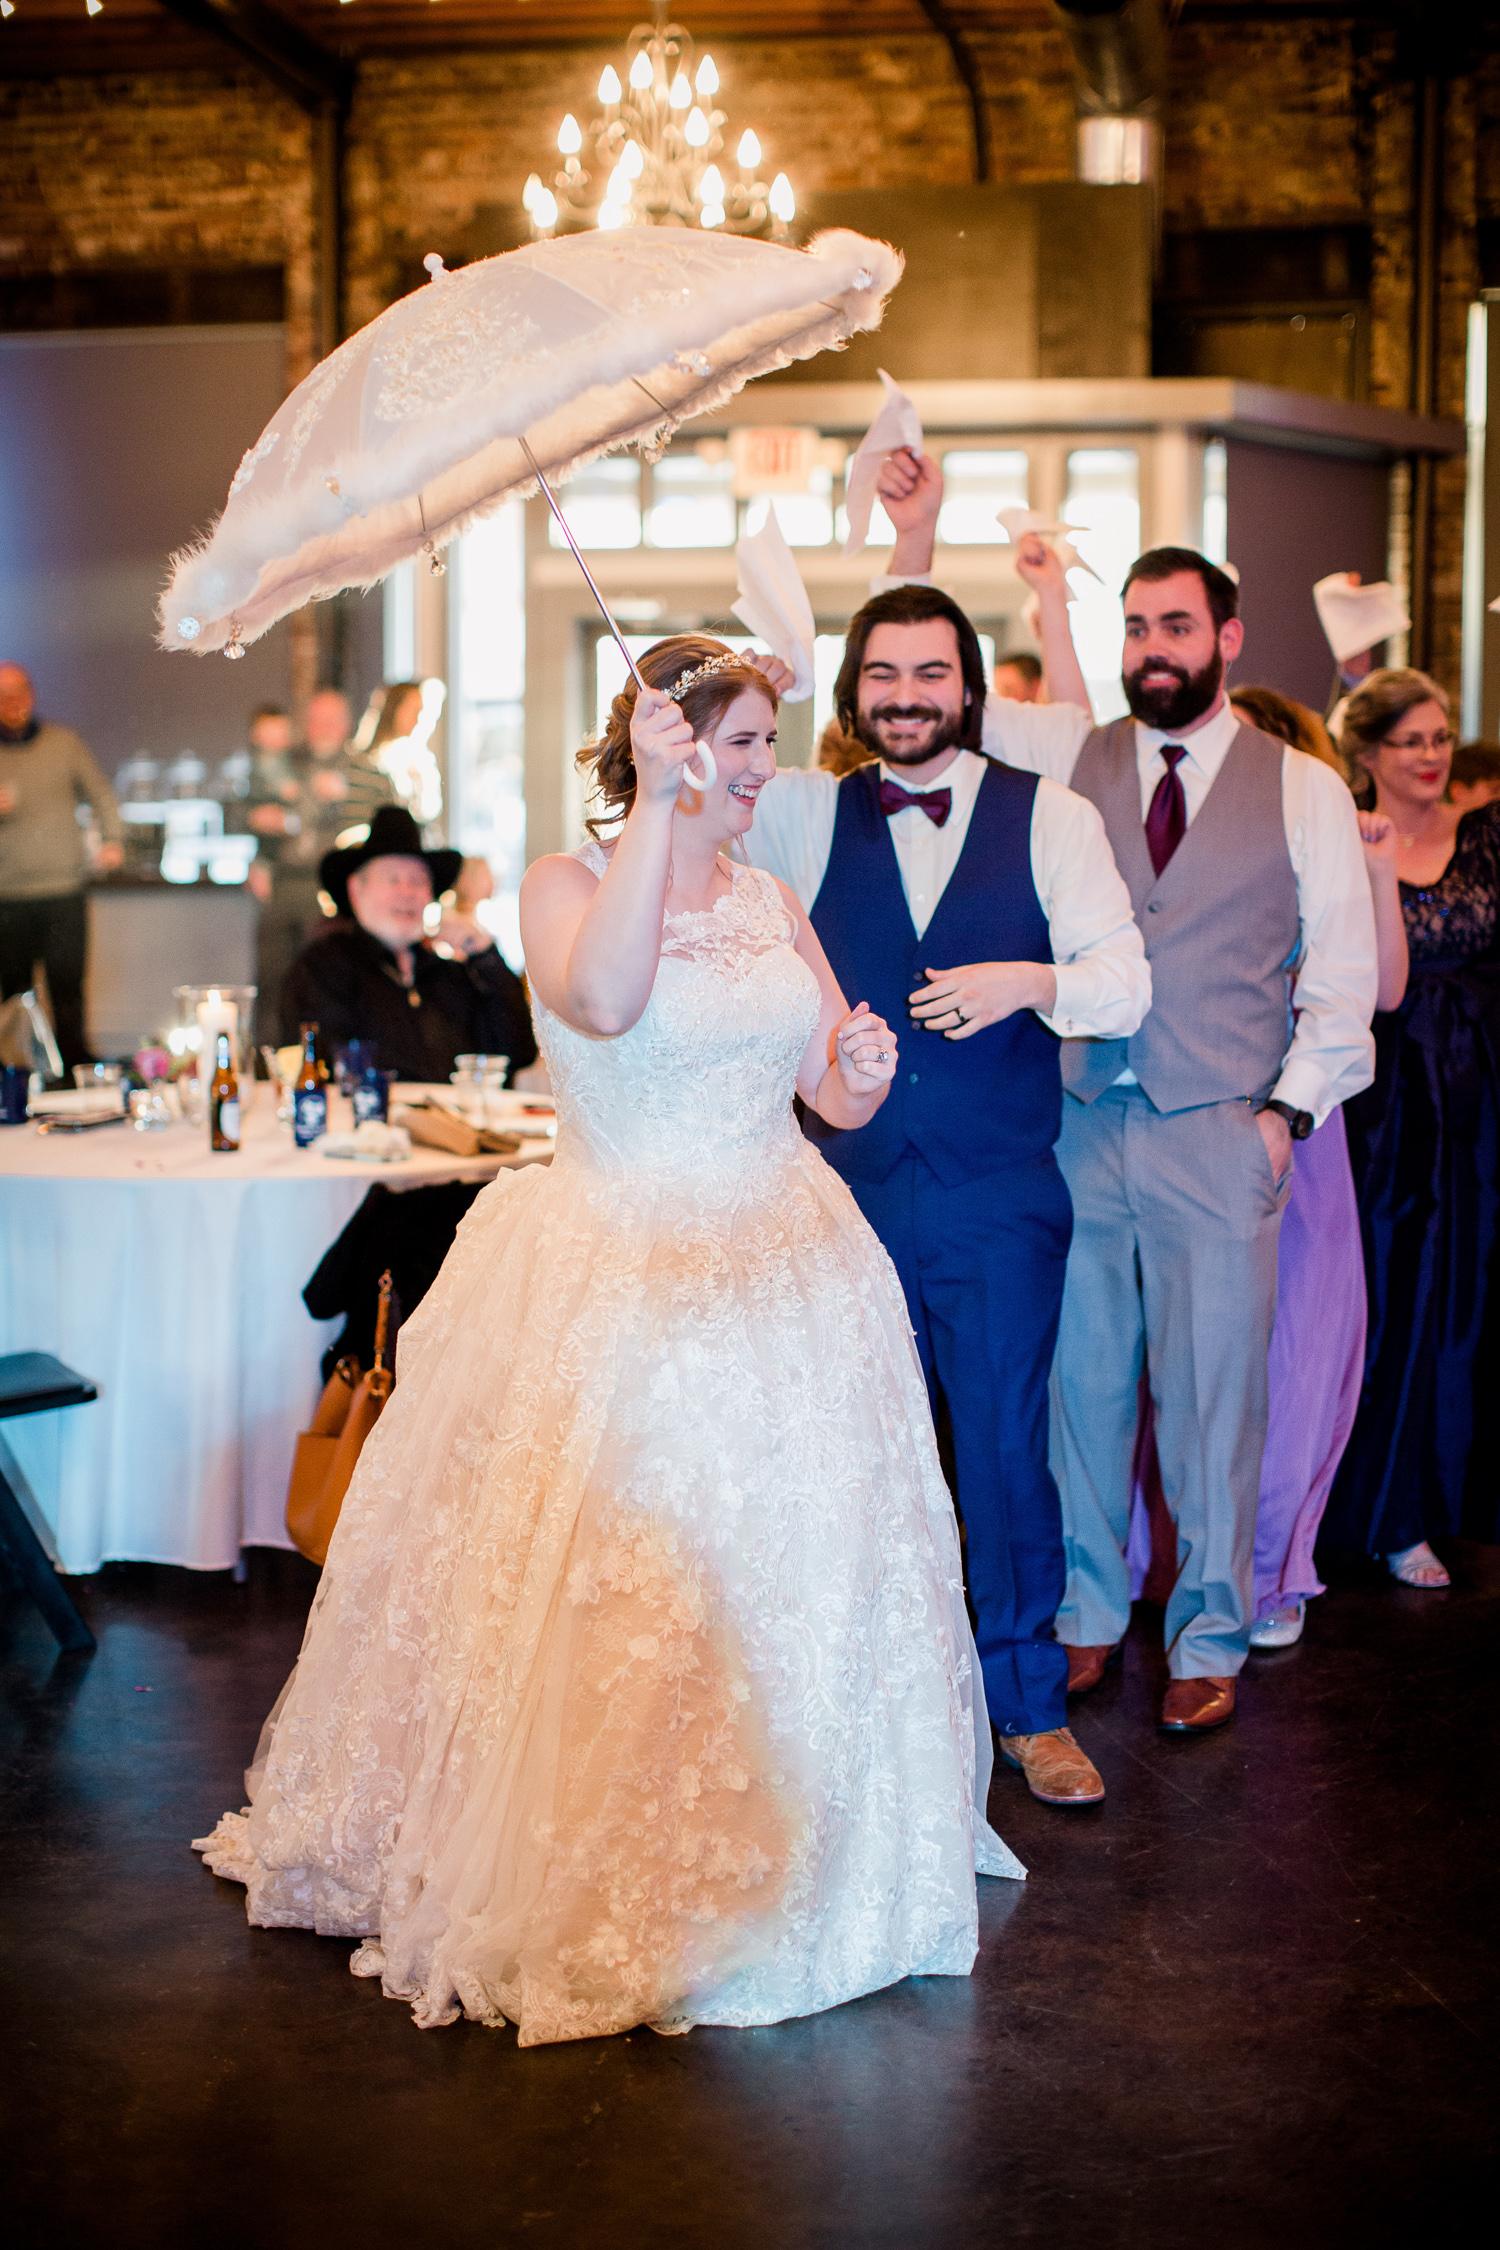 Downtown Knoxville Wedding Venue // Central Avenue Reception //  Dancing